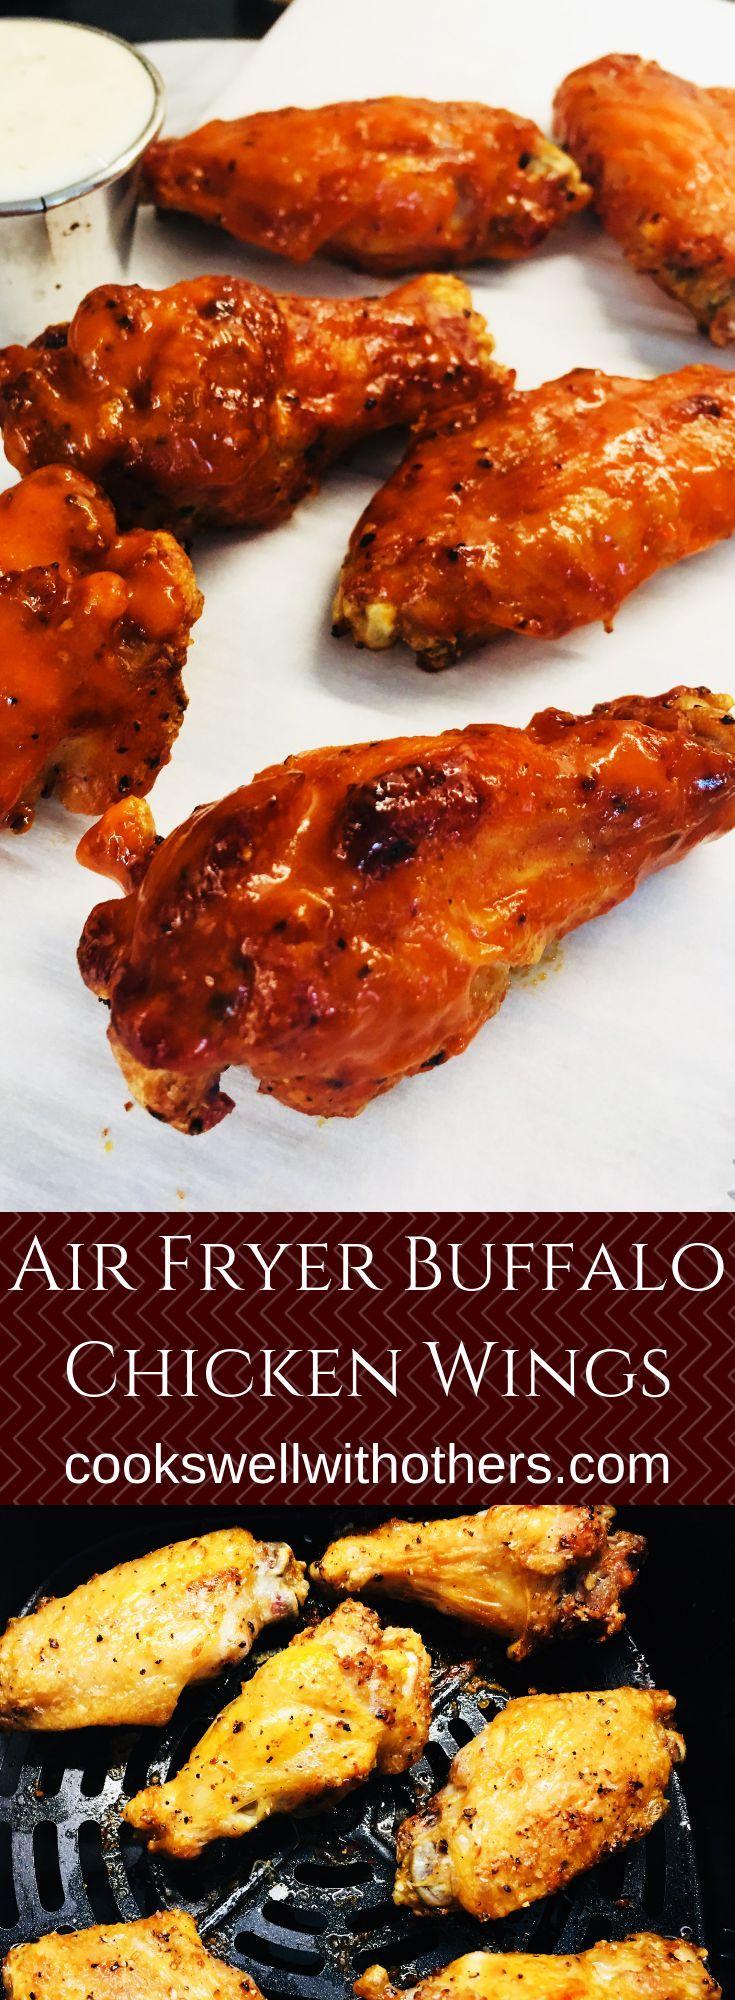 Air Fryer Buffalo Chicken Wings #airfryerrecipes